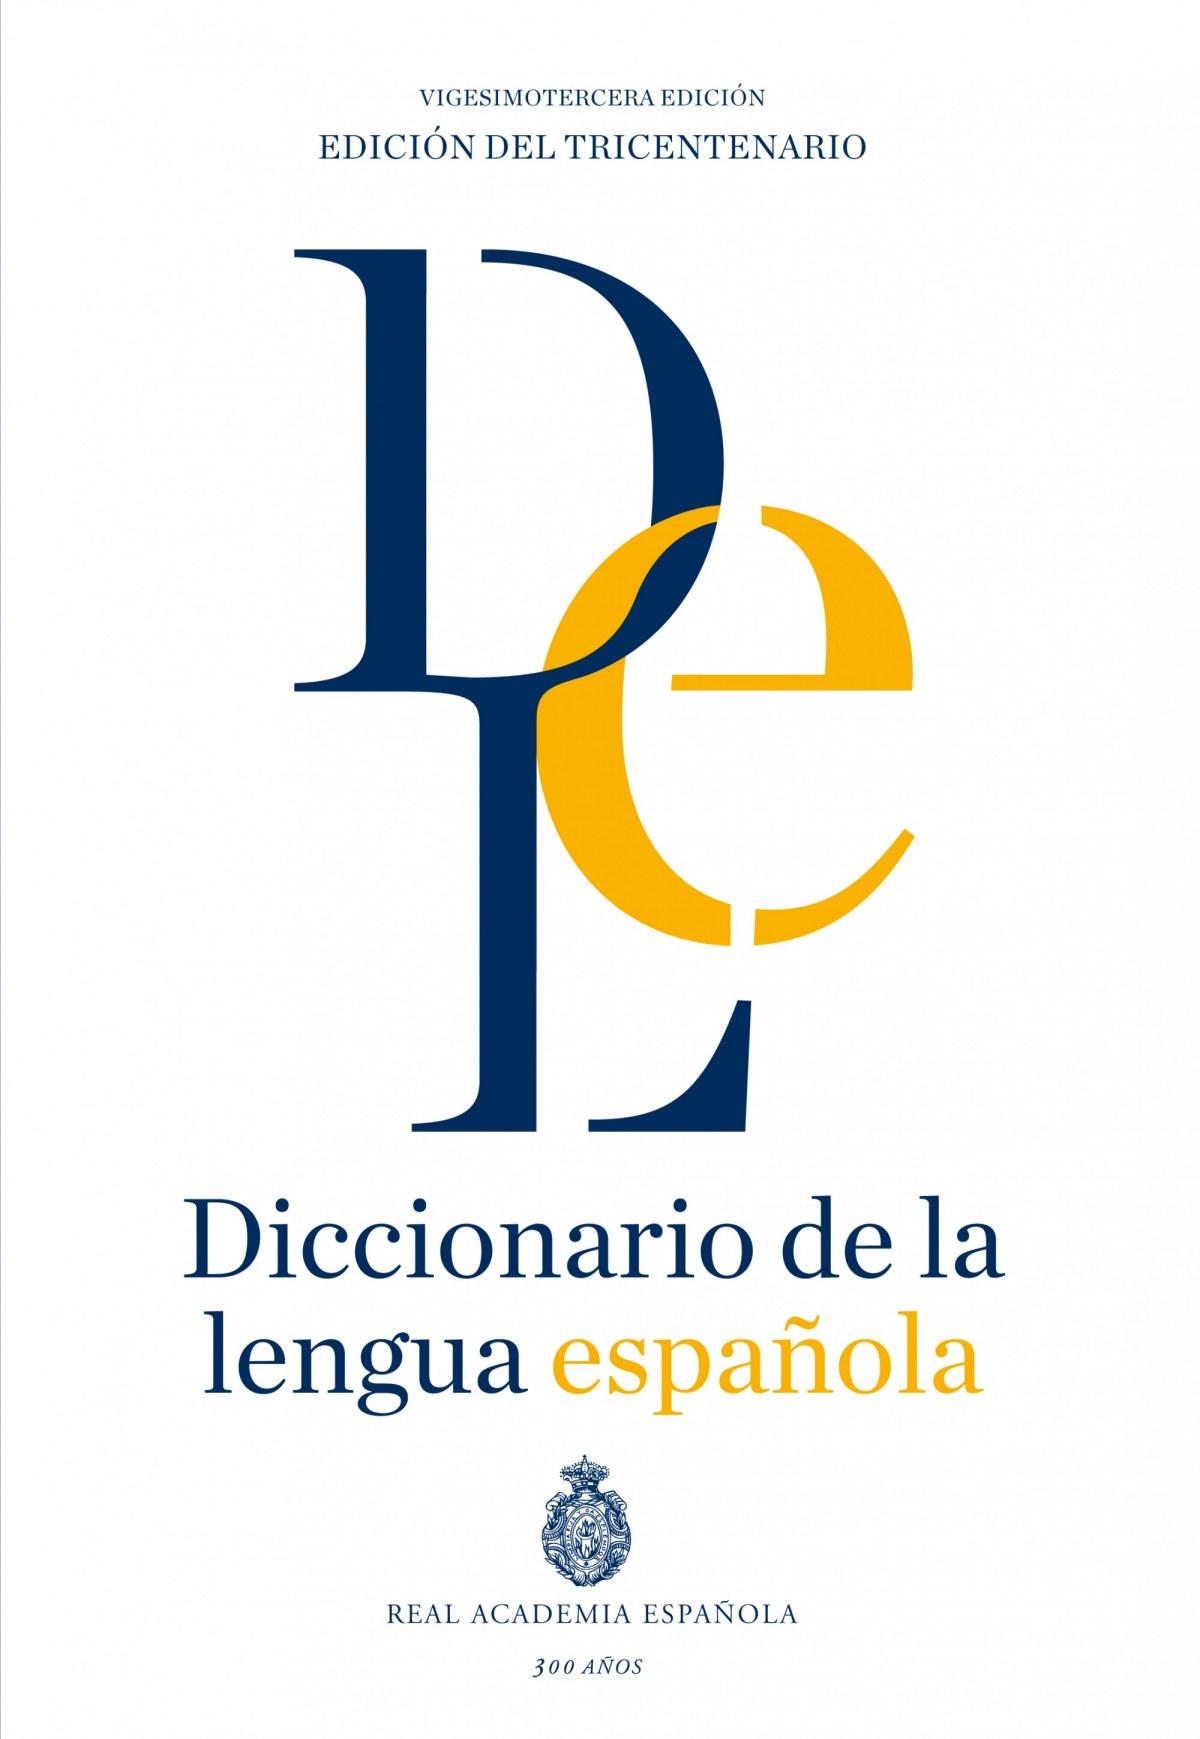 DICCIONARIO DE LA LENGUA ESPAñOLA. VIGESIMOTERCERA 9788467041897